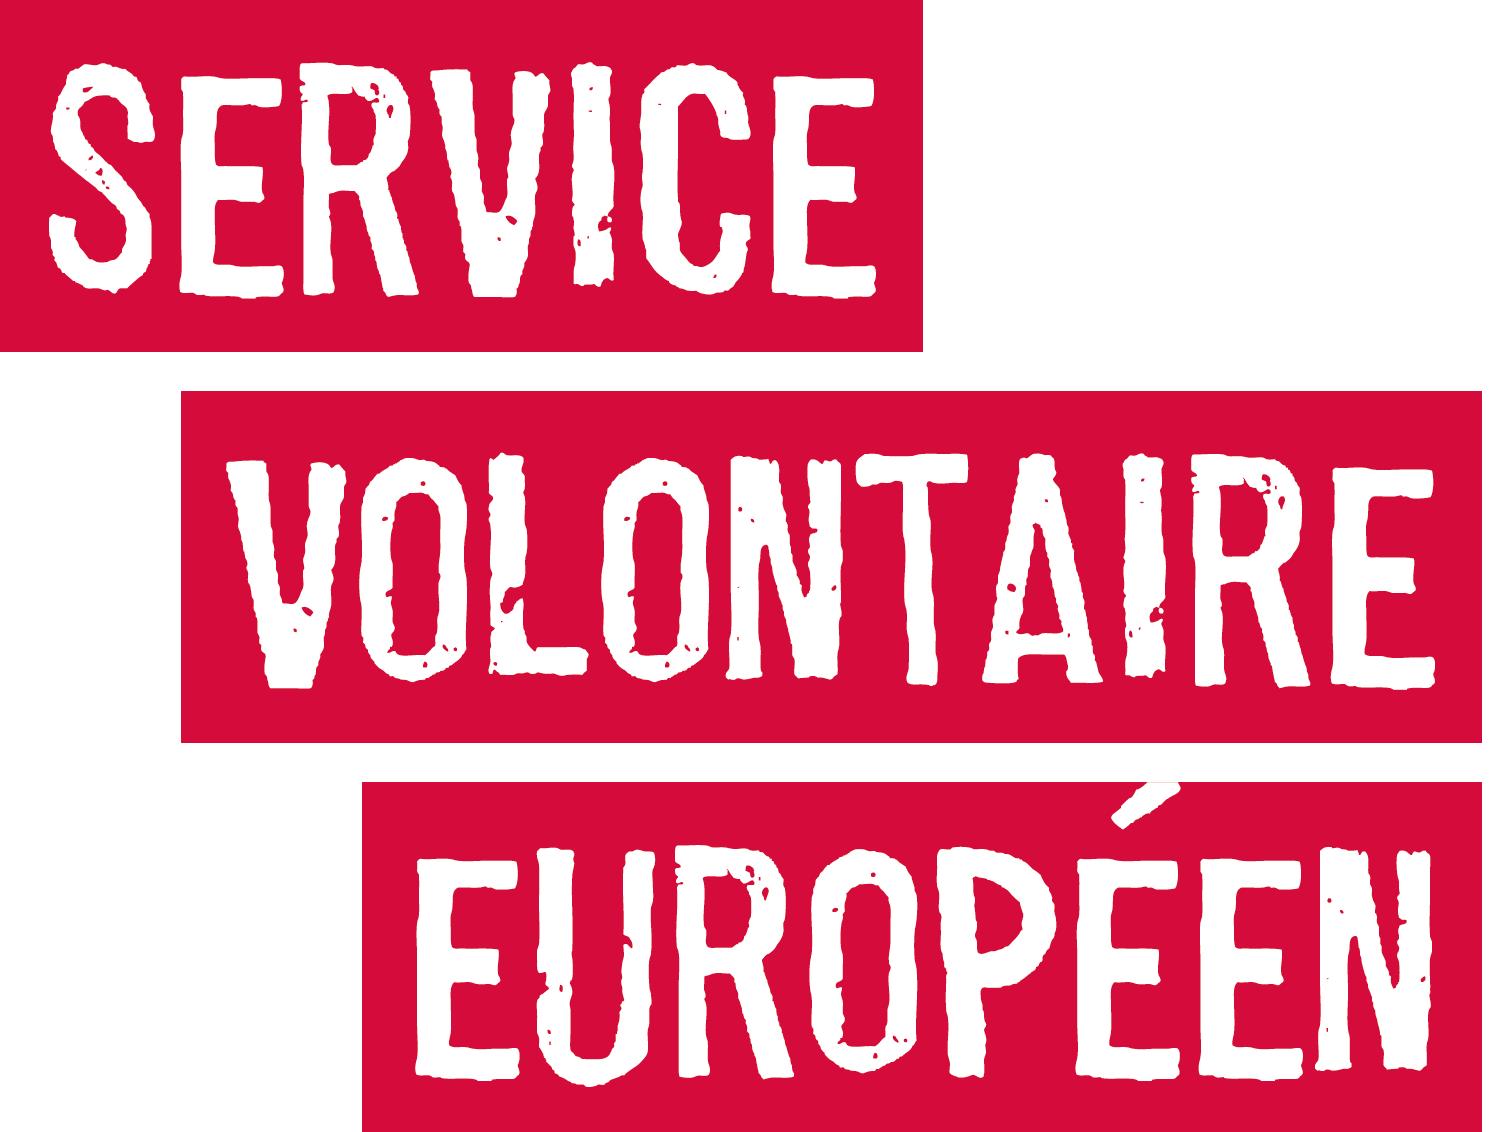 SERVICE VOLONTAIRE EUROPEEN